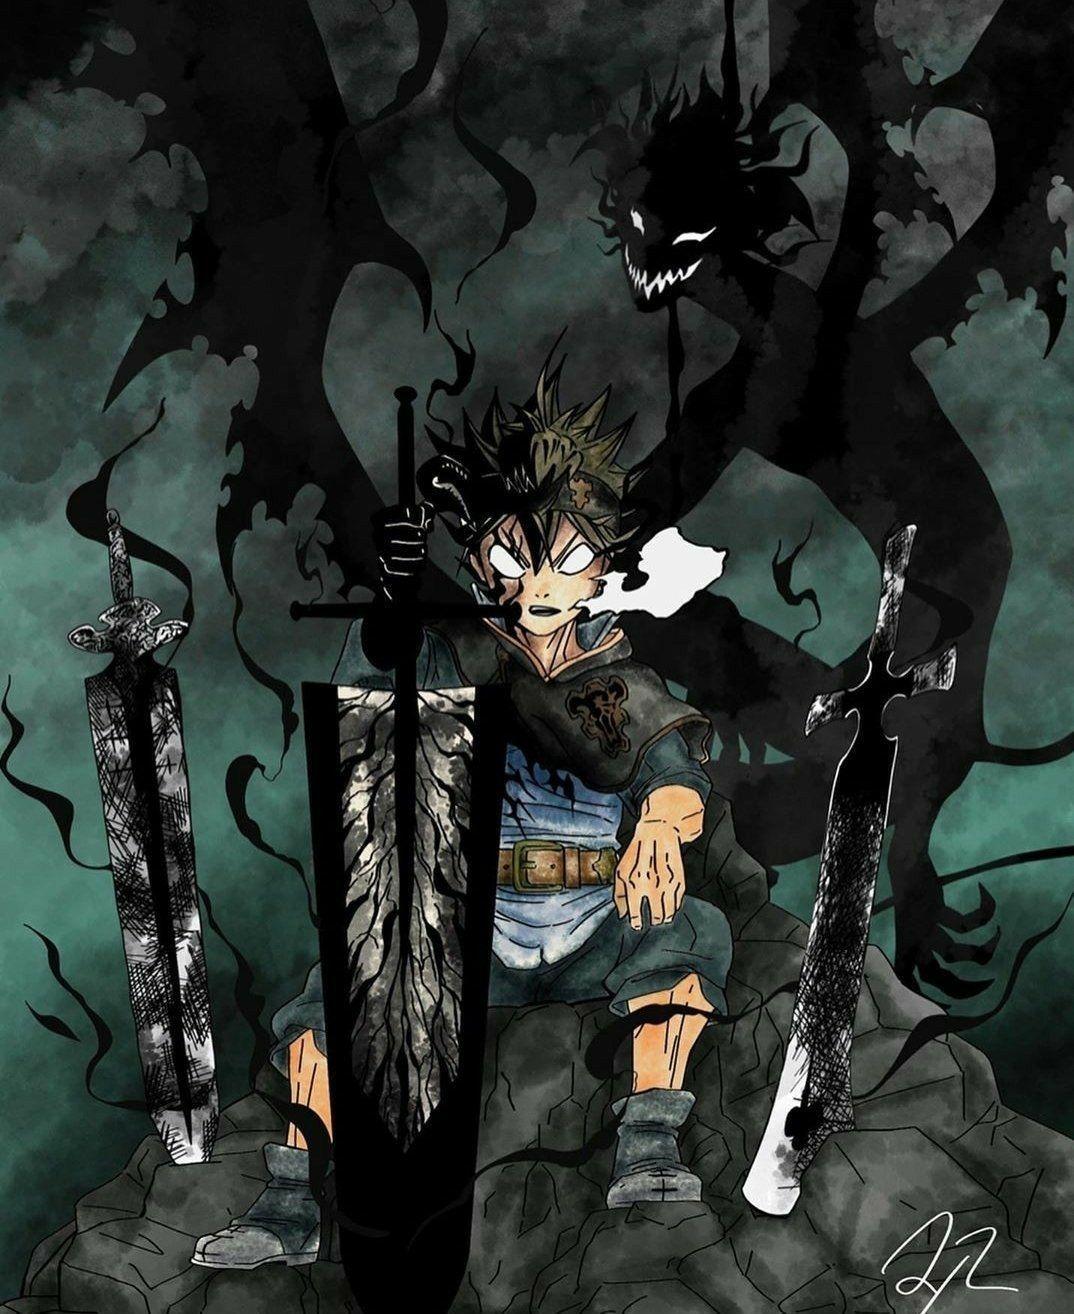 Black Clover Black Clover Characters Black Clover Asta Black